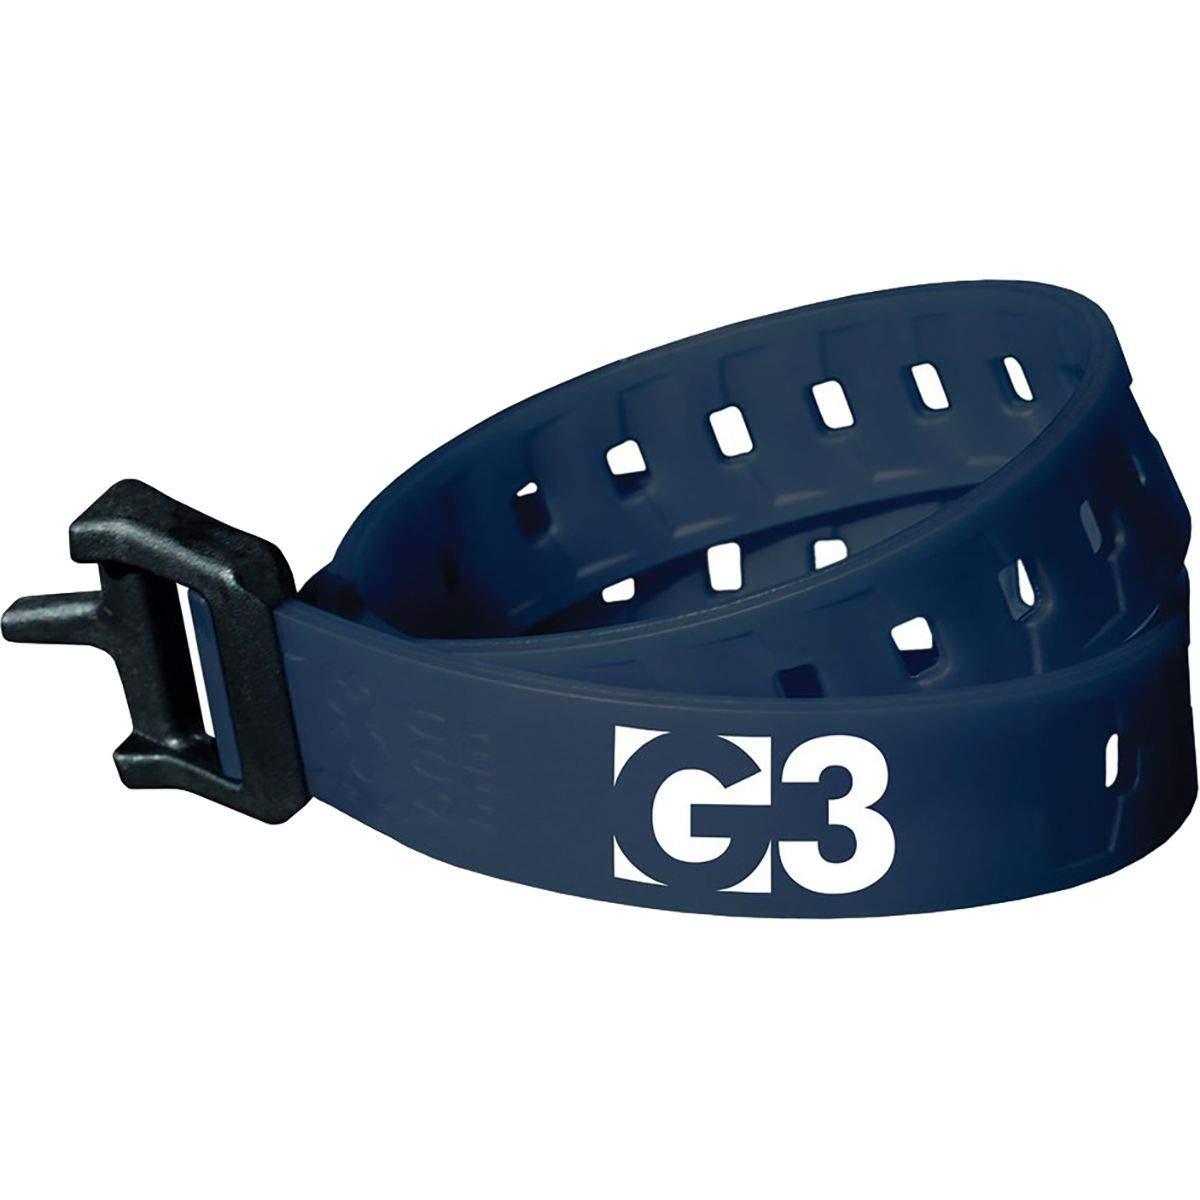 G3 Strap blue.jpg